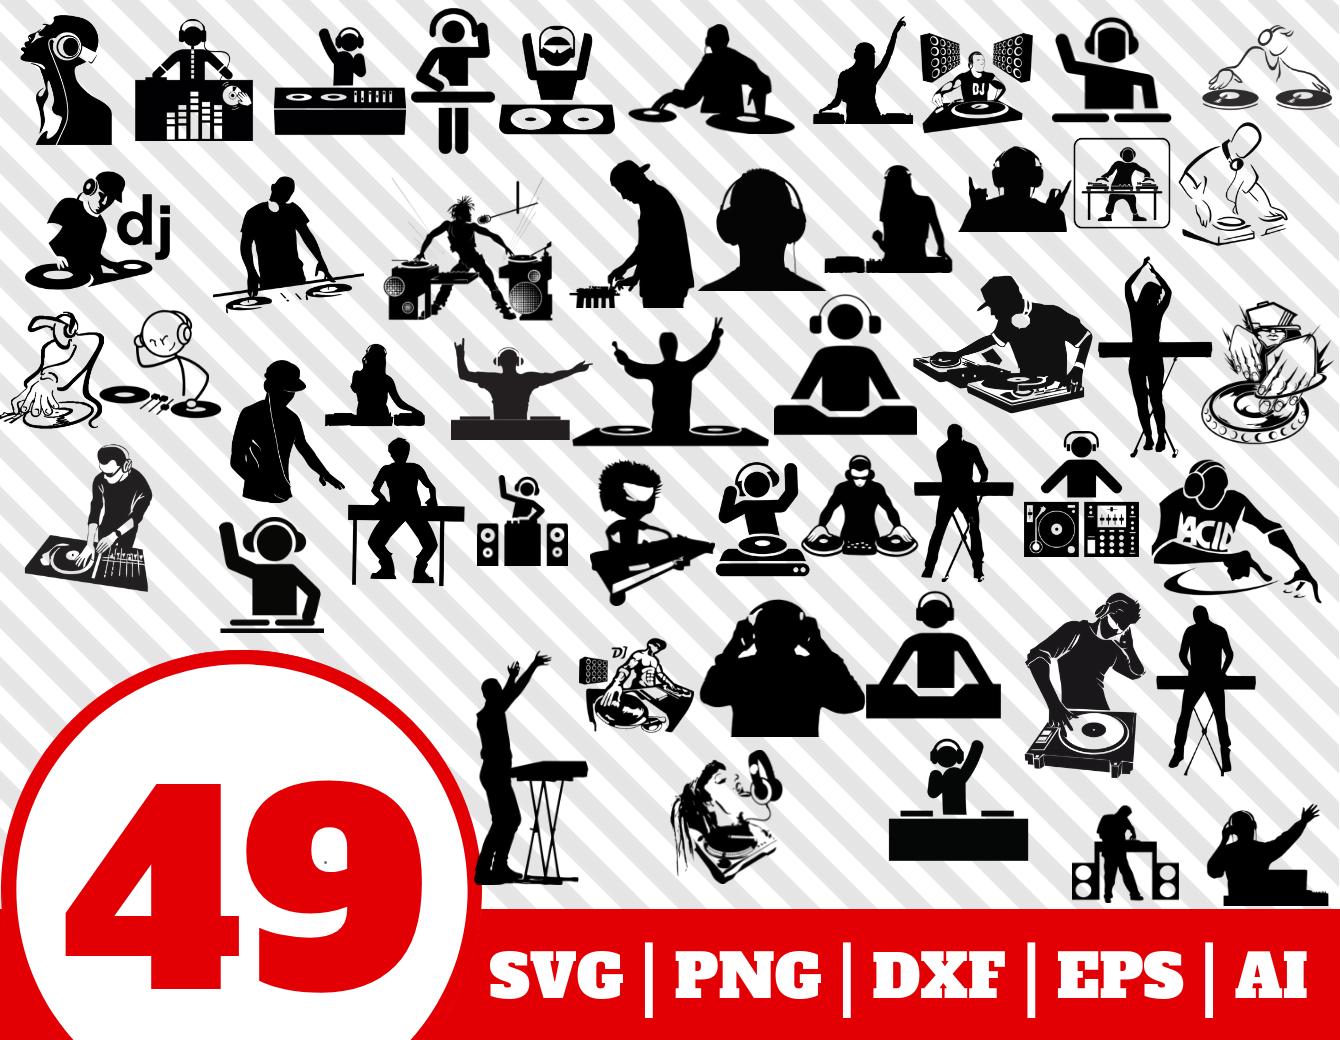 49 DJ SVG BUNDLE.